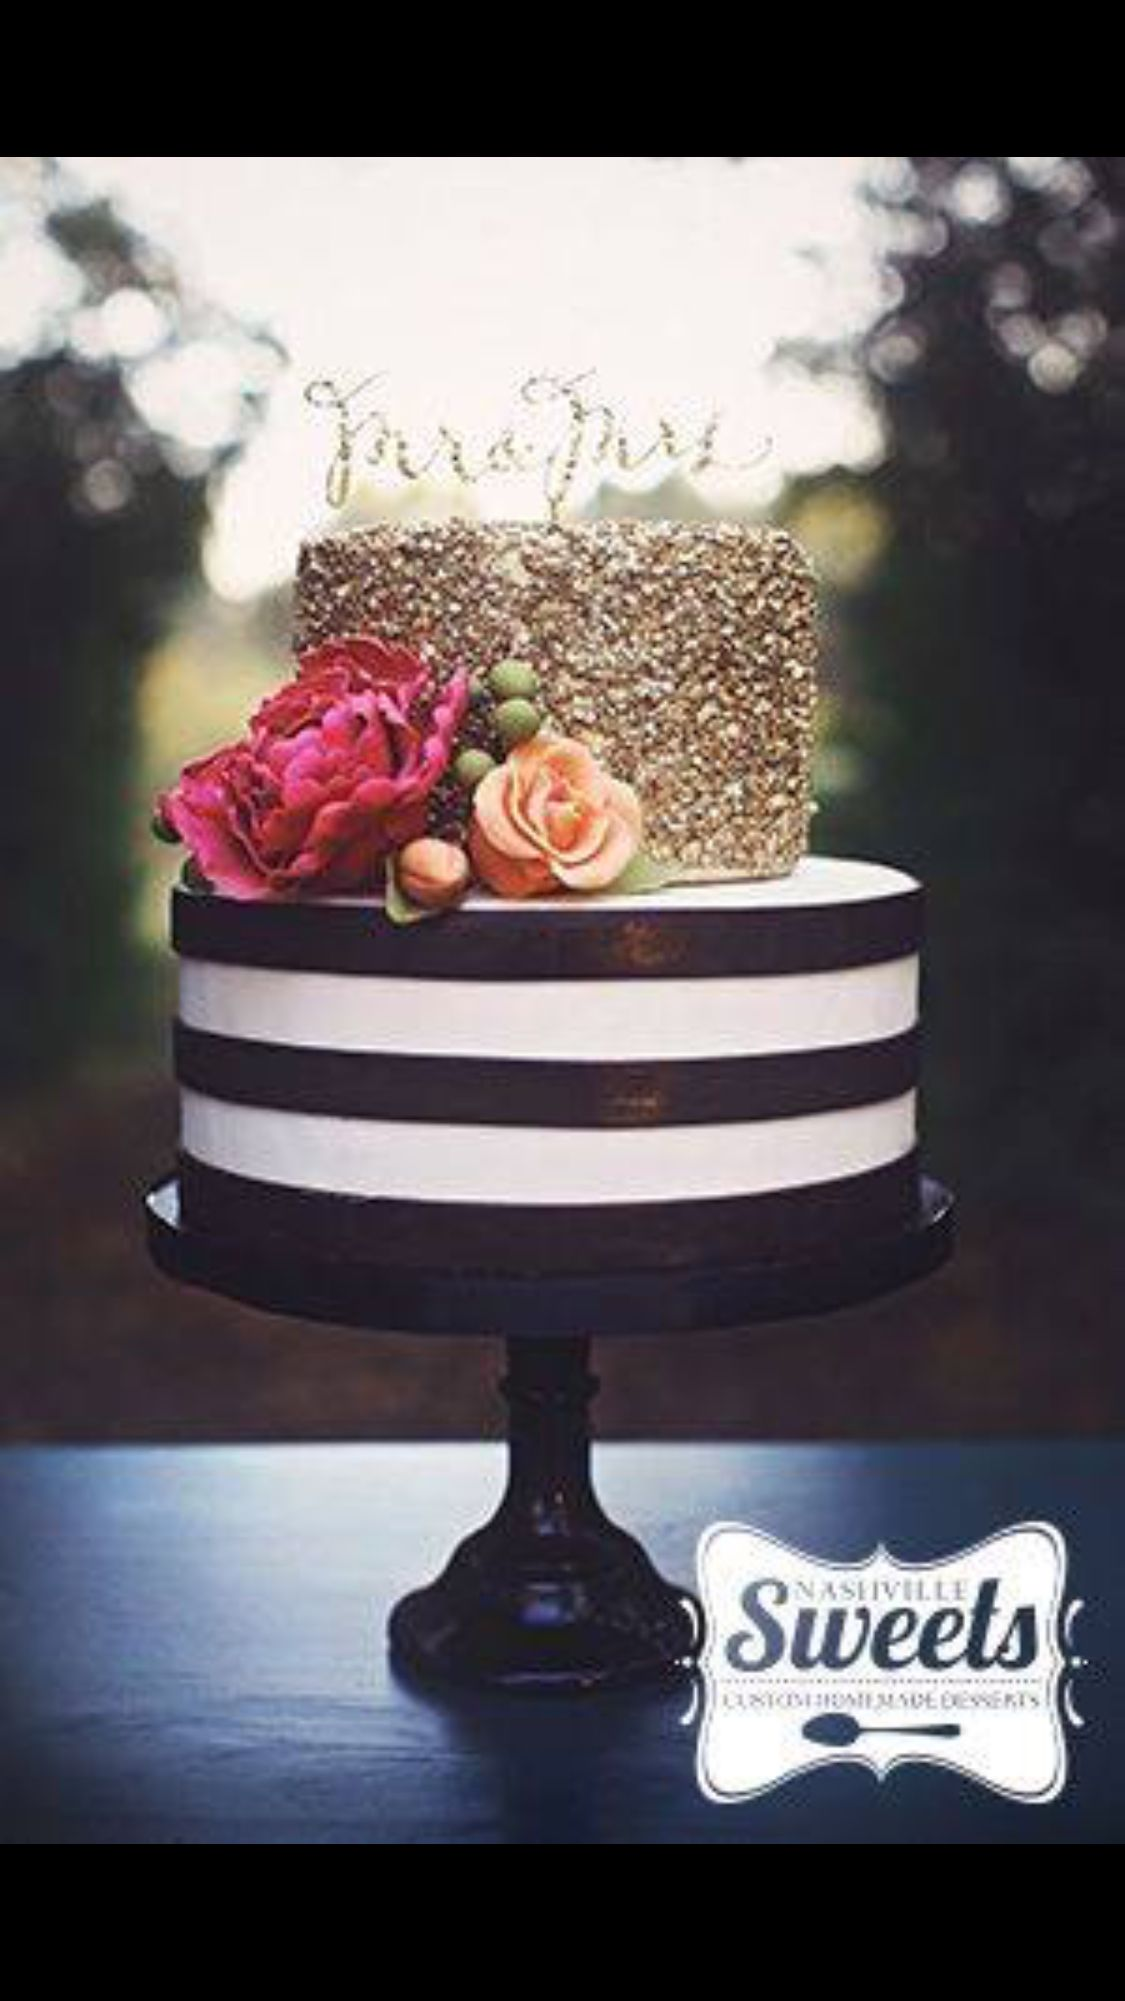 Cake inspiration | cake design ideas | Pinterest | Pastelería y Cocinas